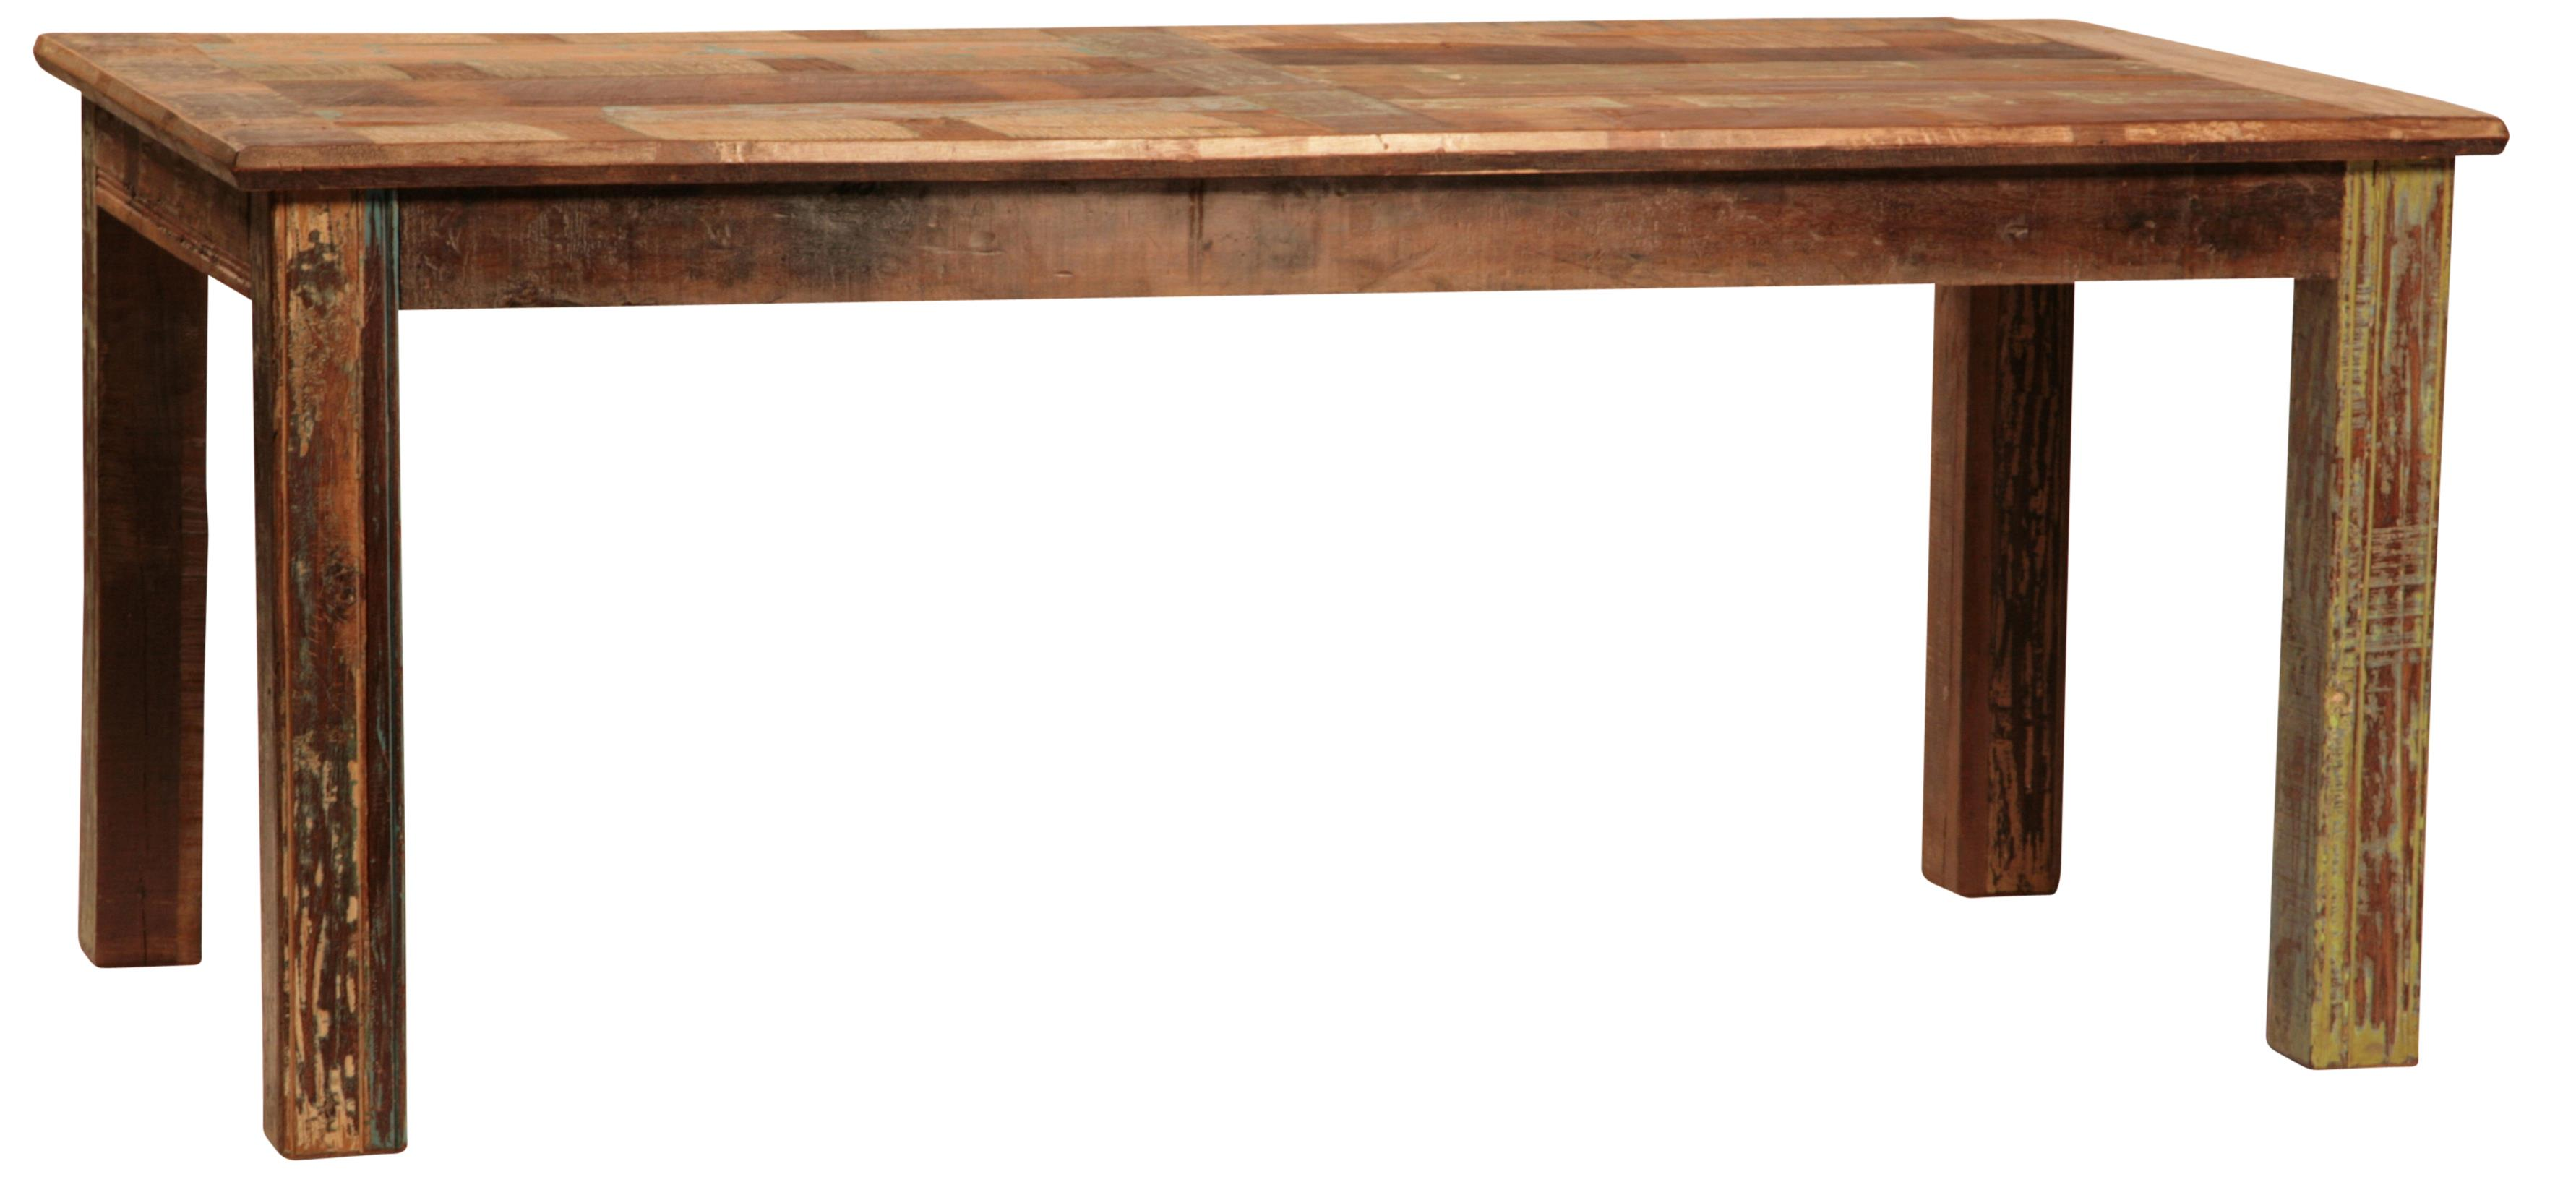 Dovetail furniture dovetail rectangular dining leg table for Dovetail furniture